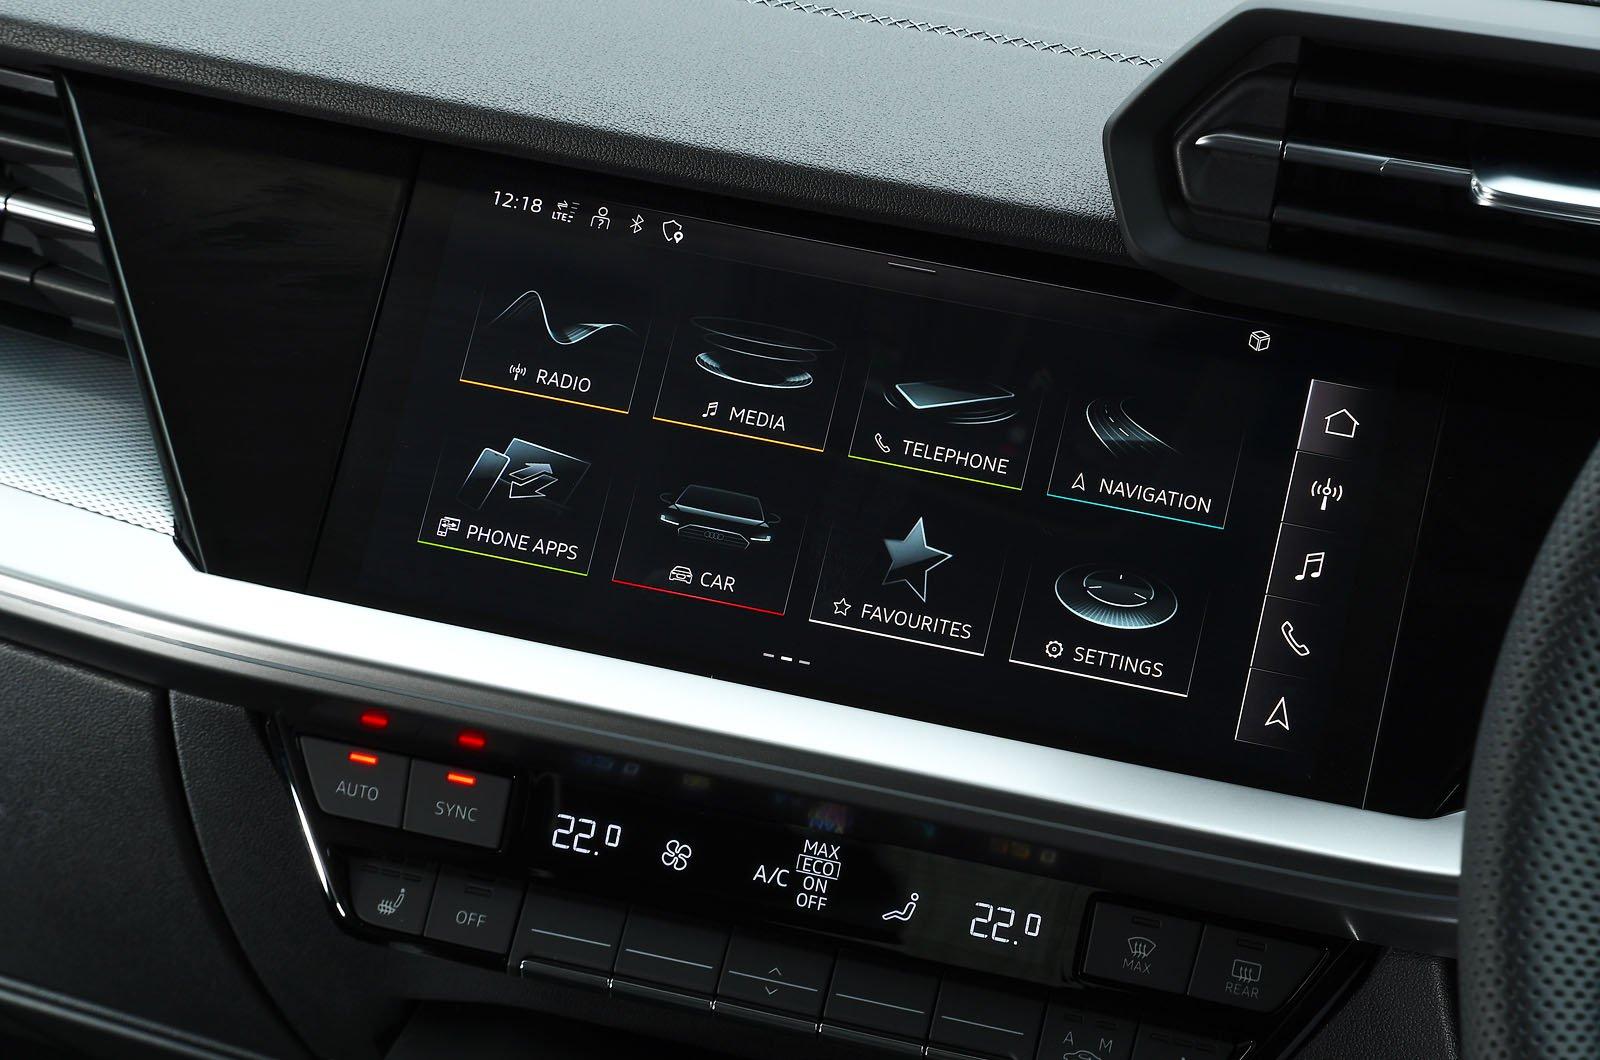 Audi A3 40 TFSIe 2021 touchscreen